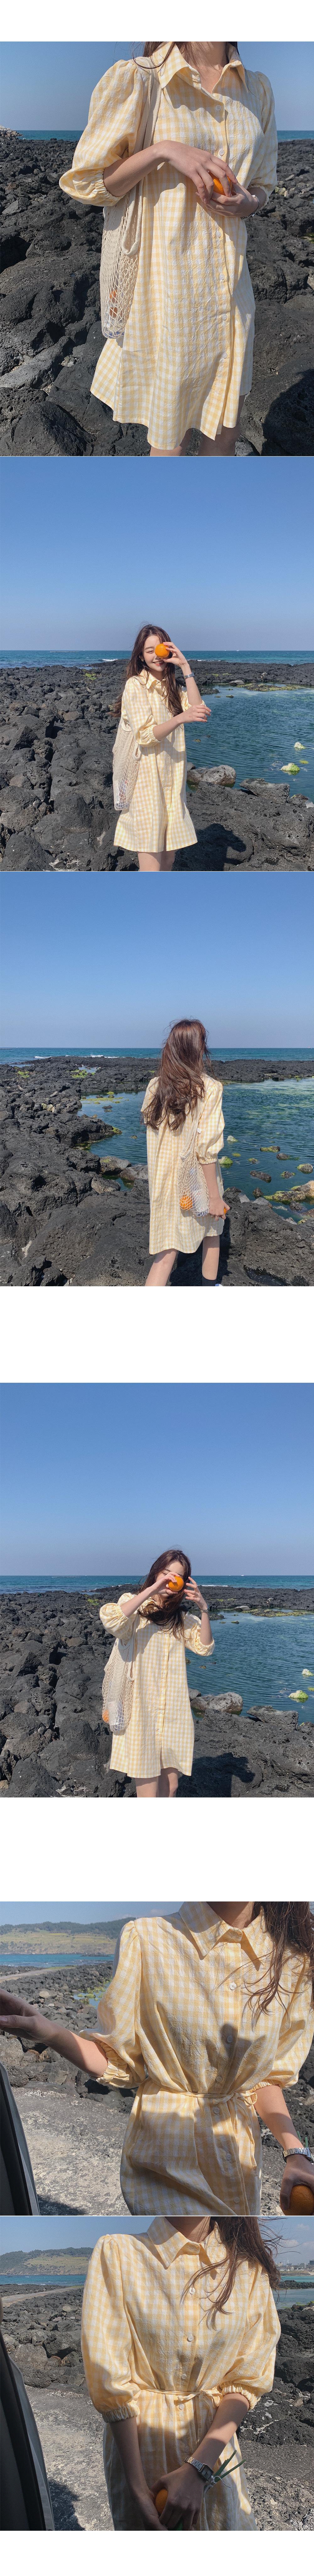 Sponge check dress